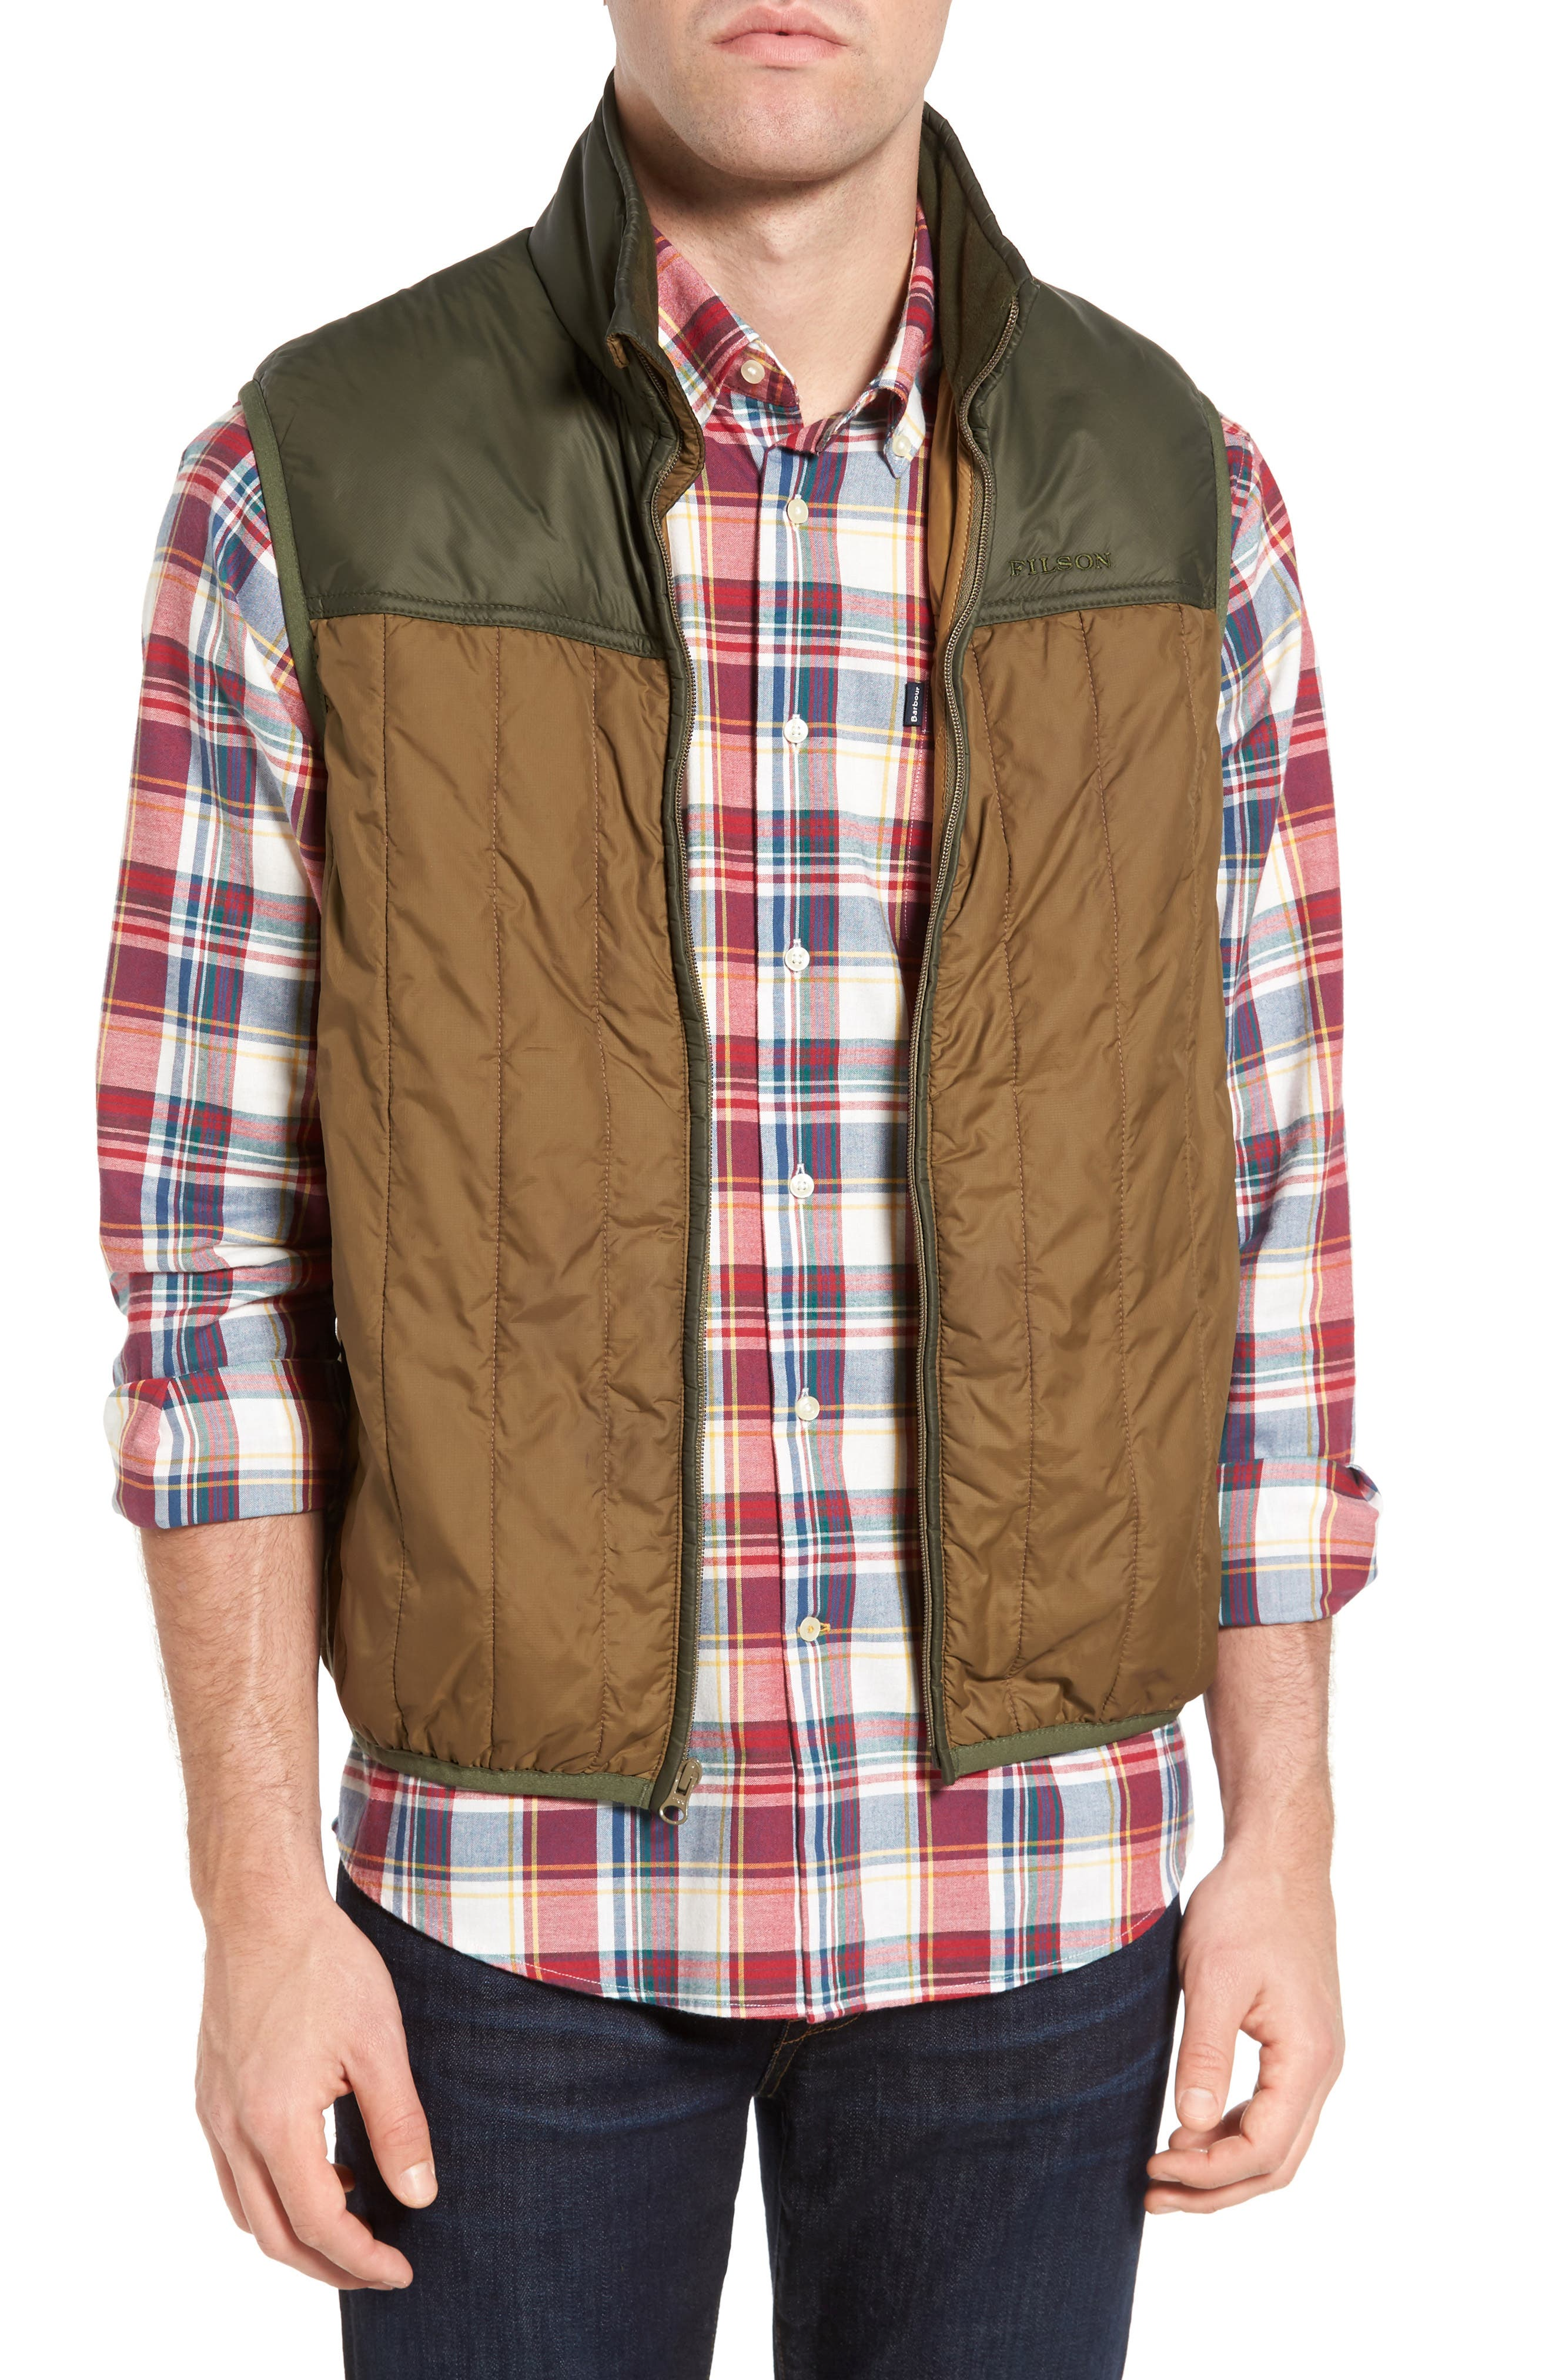 Ultra Light Vest,                             Main thumbnail 1, color,                             Field Olive